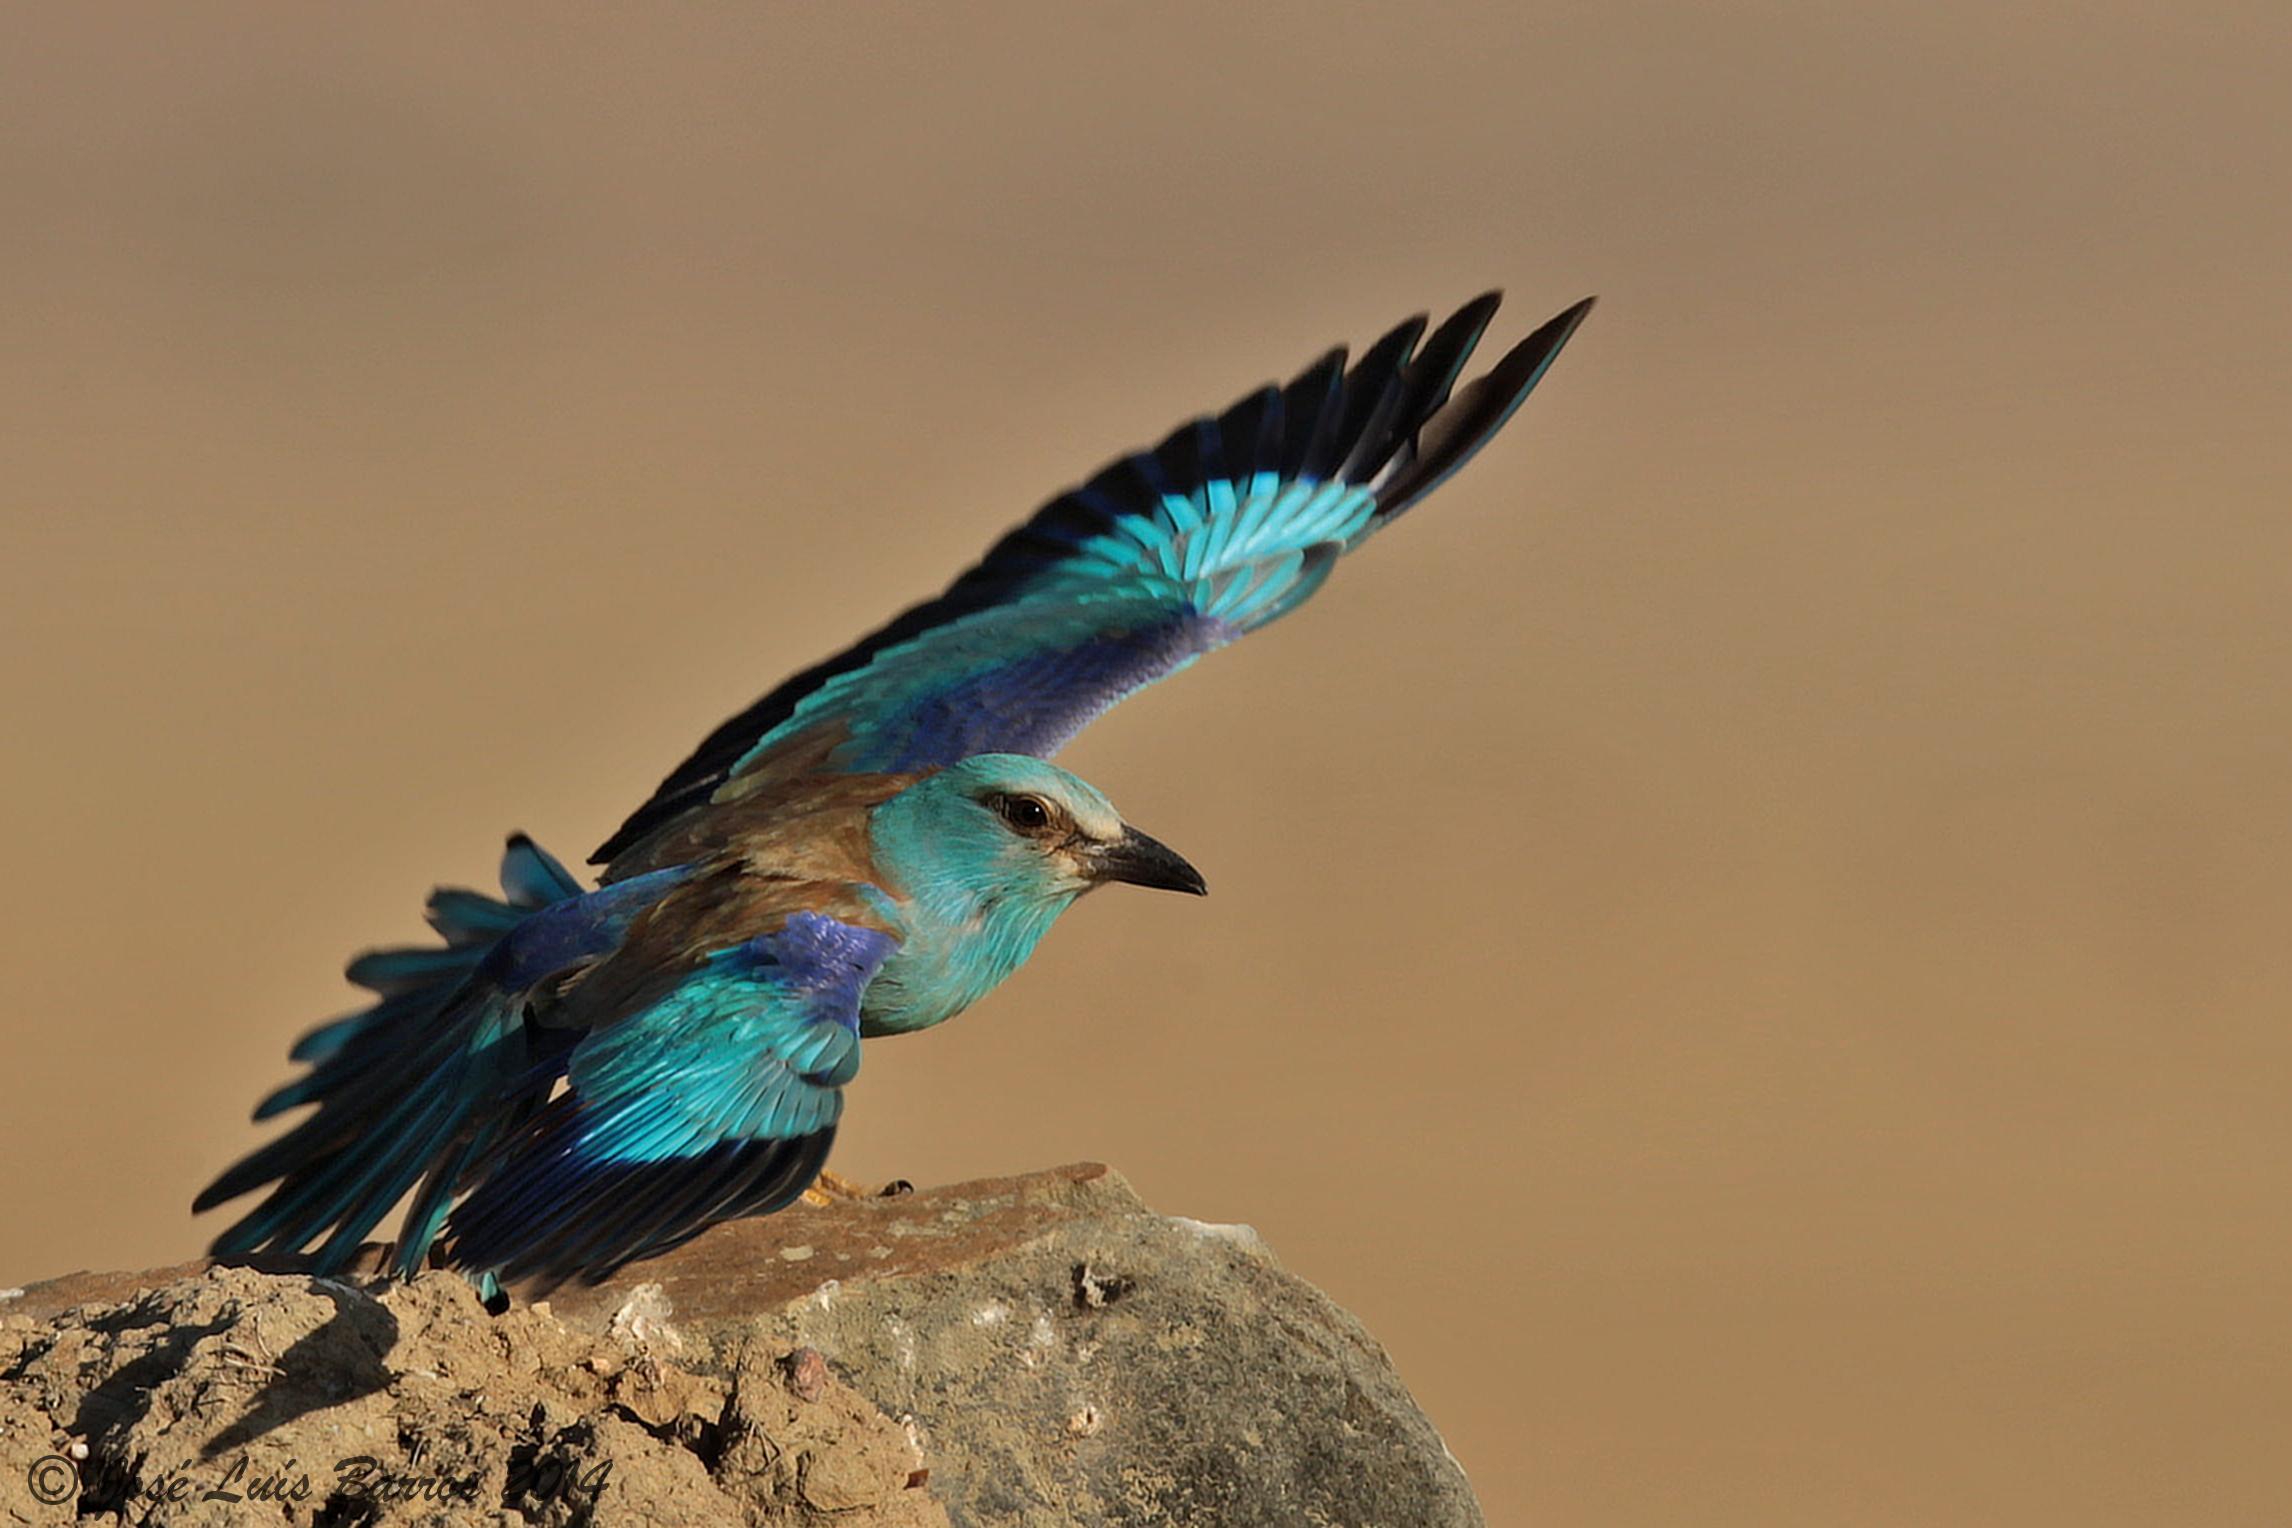 Fond D Ecran Rouleau Faune Plume Le Bec Oiseau Bleu Aile Geai 2292x1528 903818 Fond D Ecran Wallhere